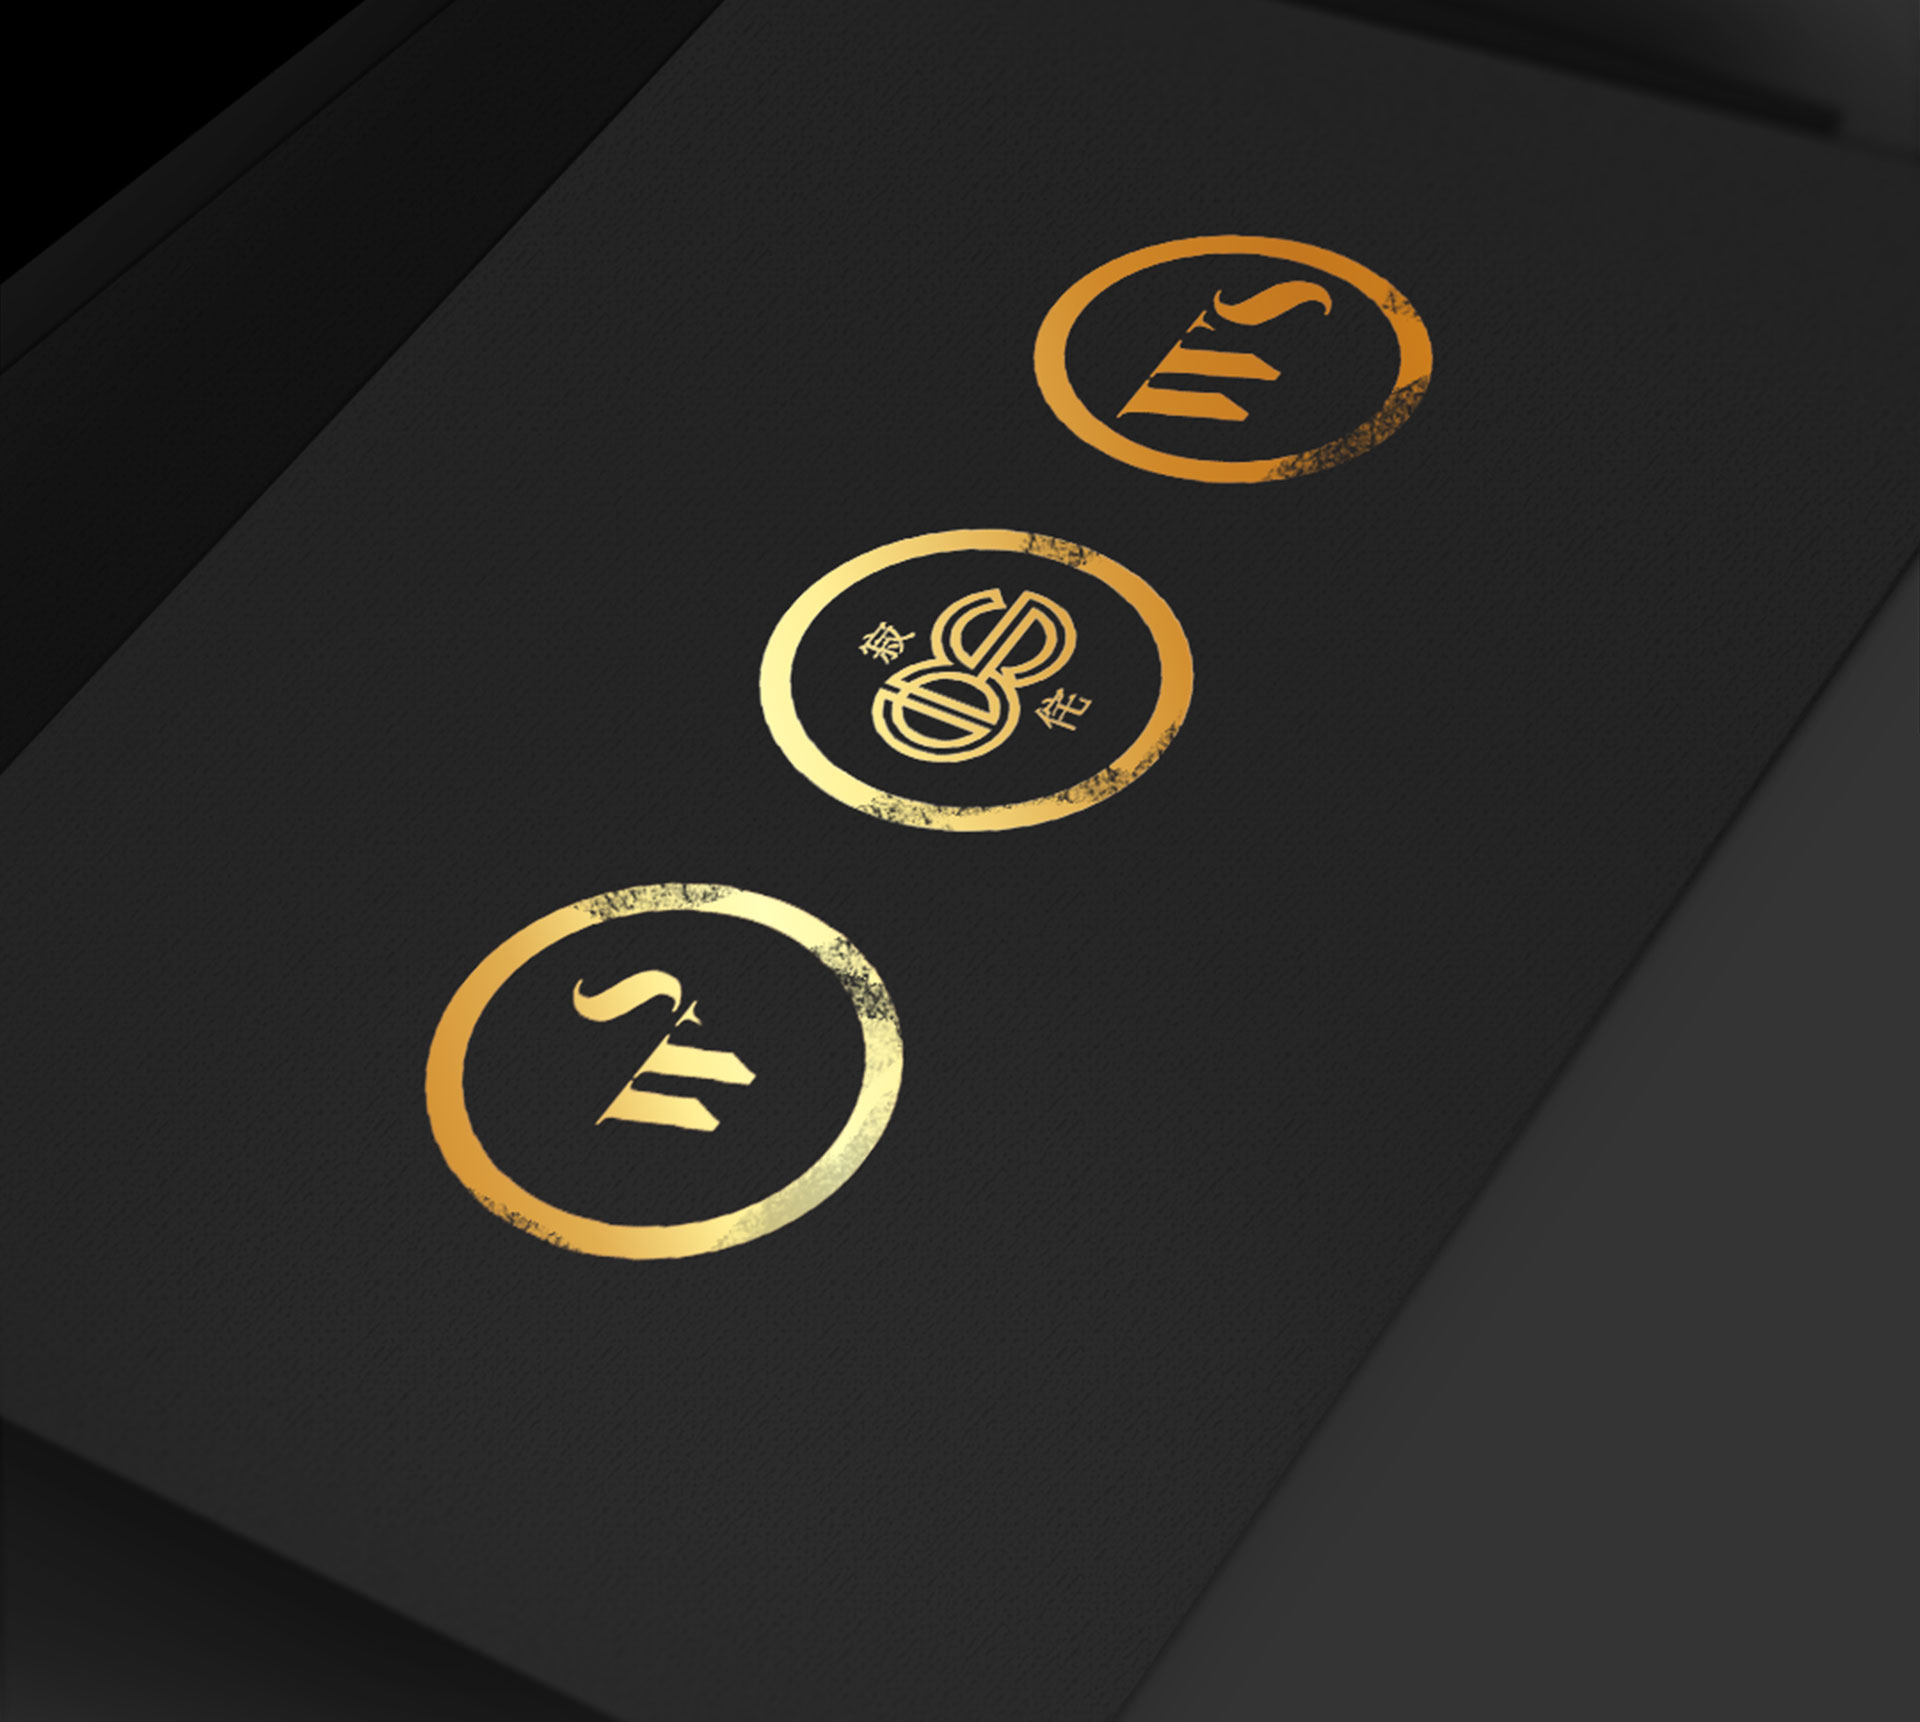 Branding gold logo variations interior design סקיצות לוגו מיתוג מעצבת פנים Wabi Sabi